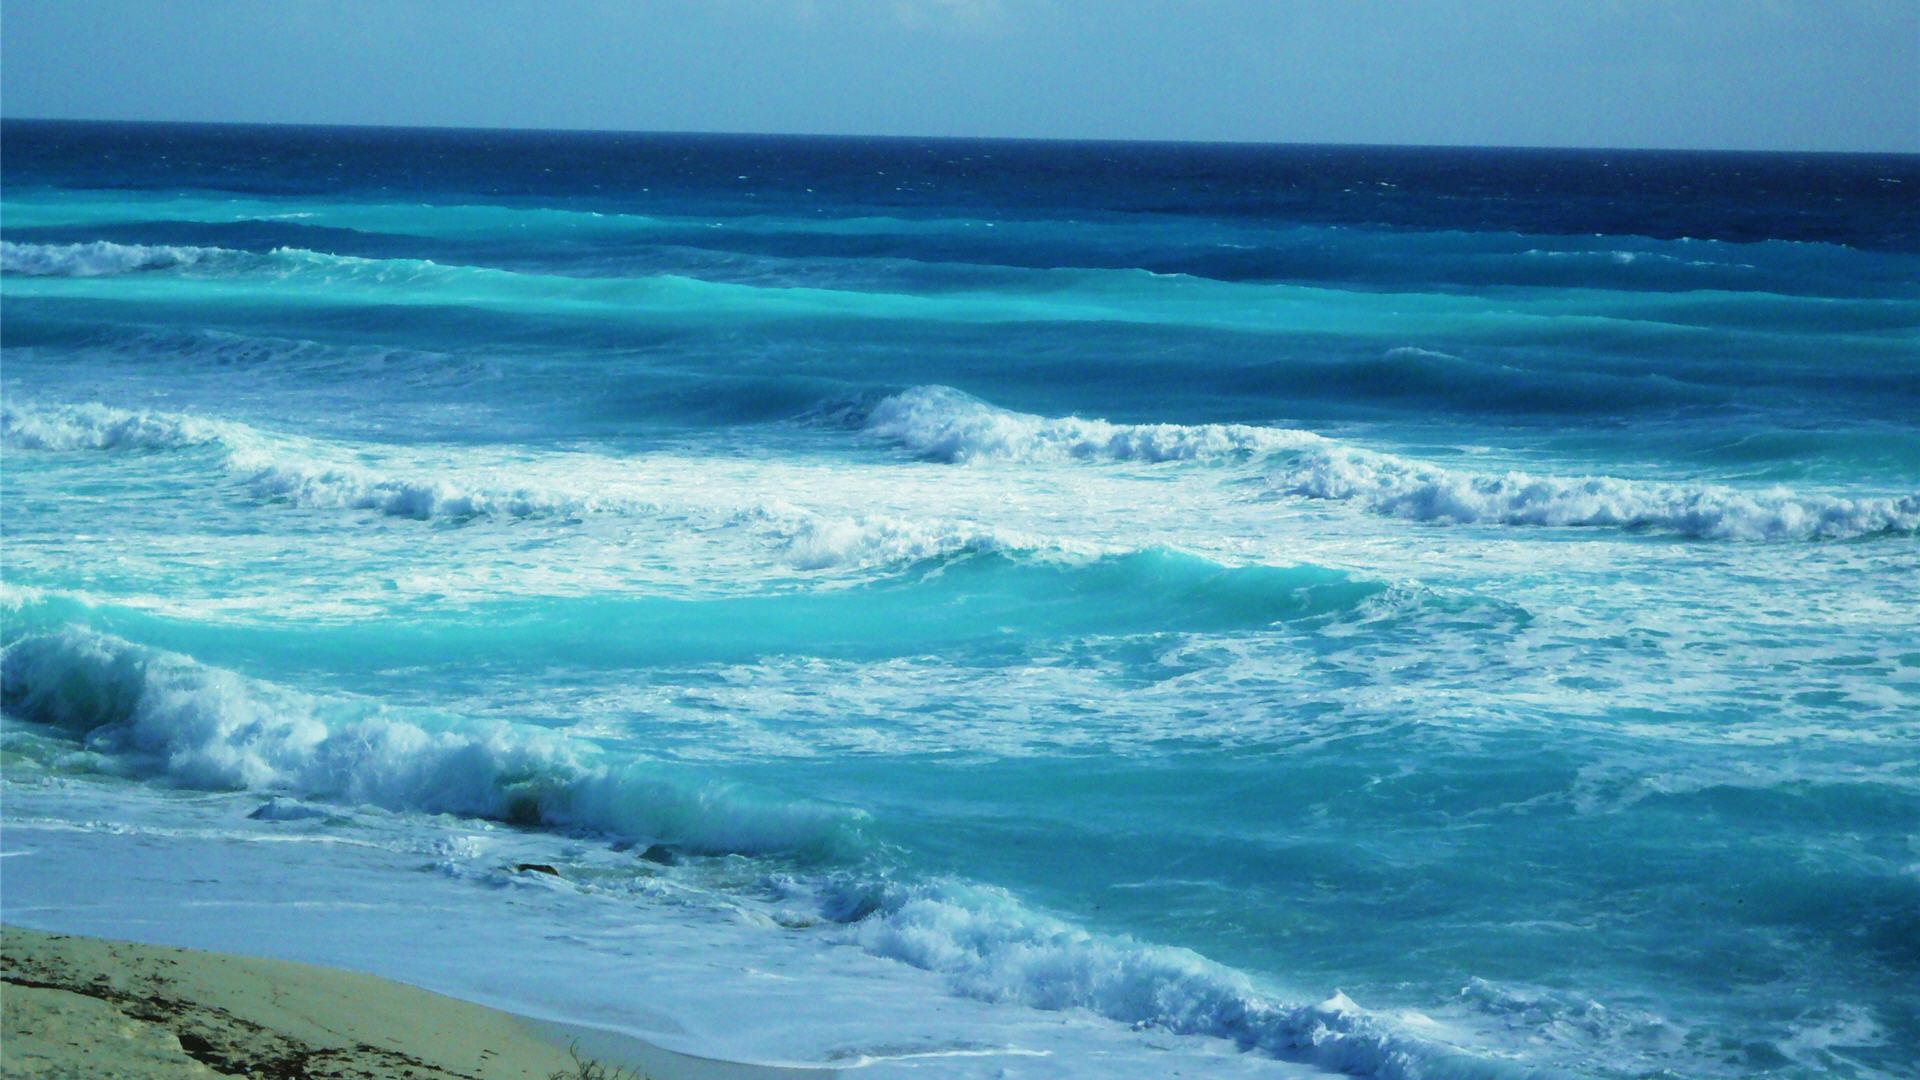 waves crystal ocean wallpaper which is under the ocean wallpapers 1920x1080